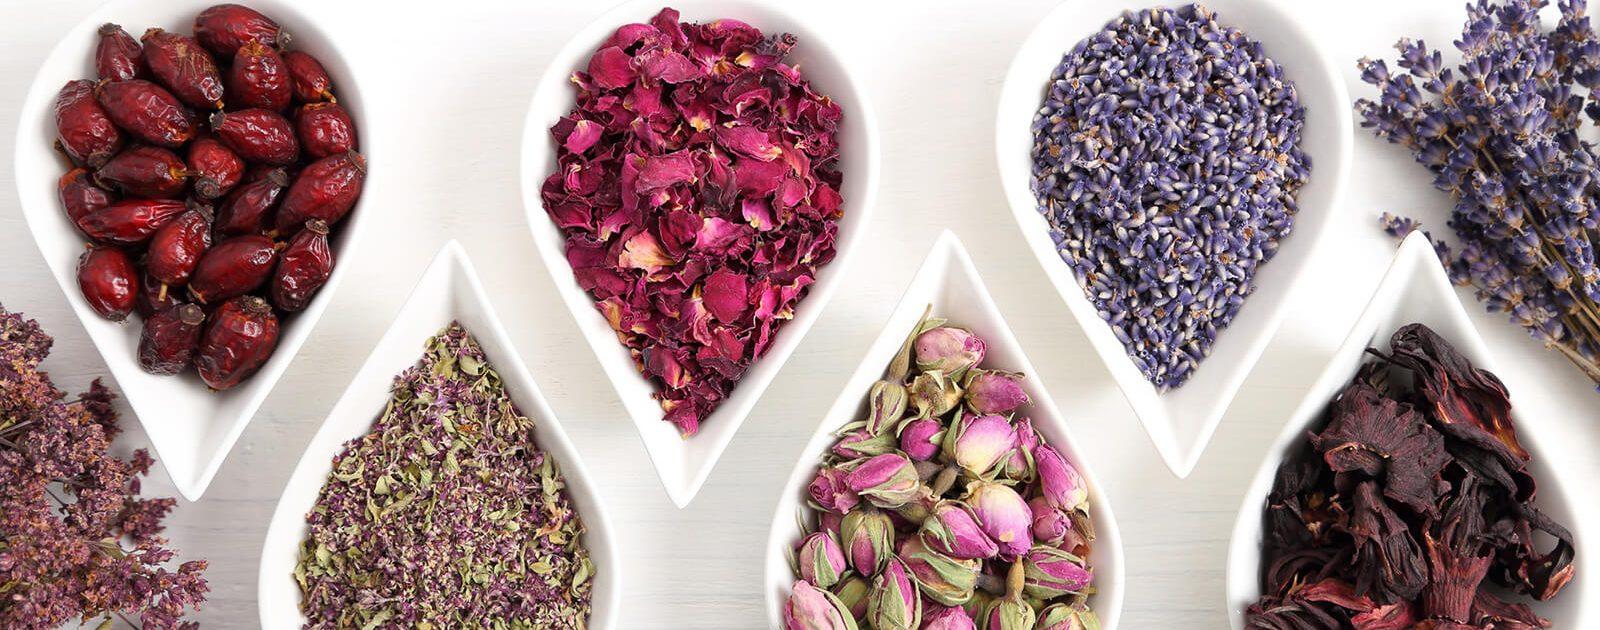 Aromablüten, um den Geruchssinn zu trainieren